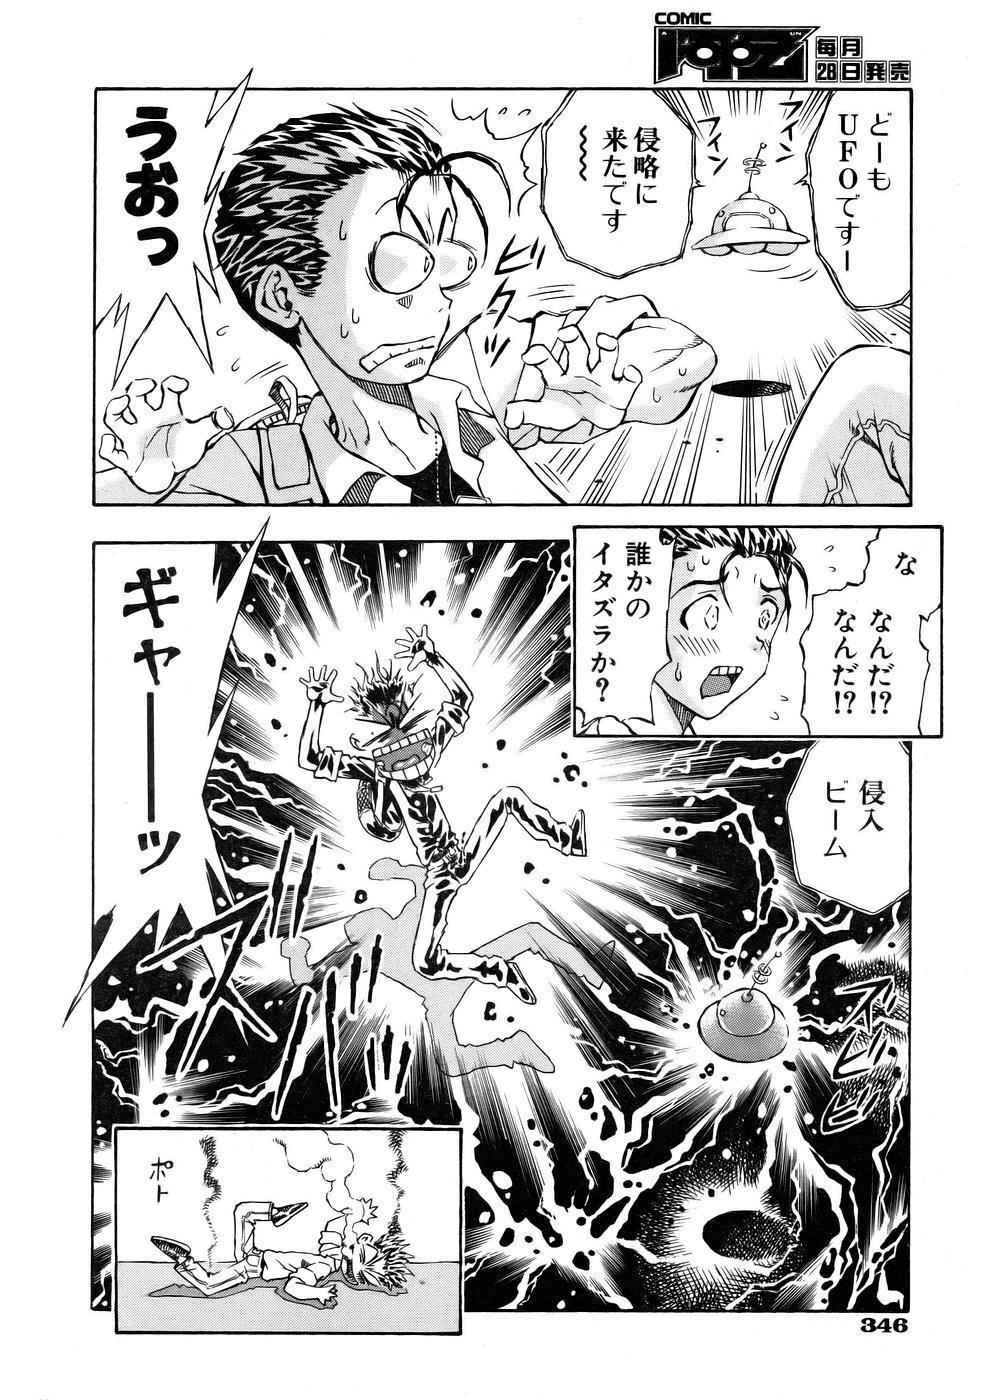 COMIC AUN 2005-10 Vol. 113 343